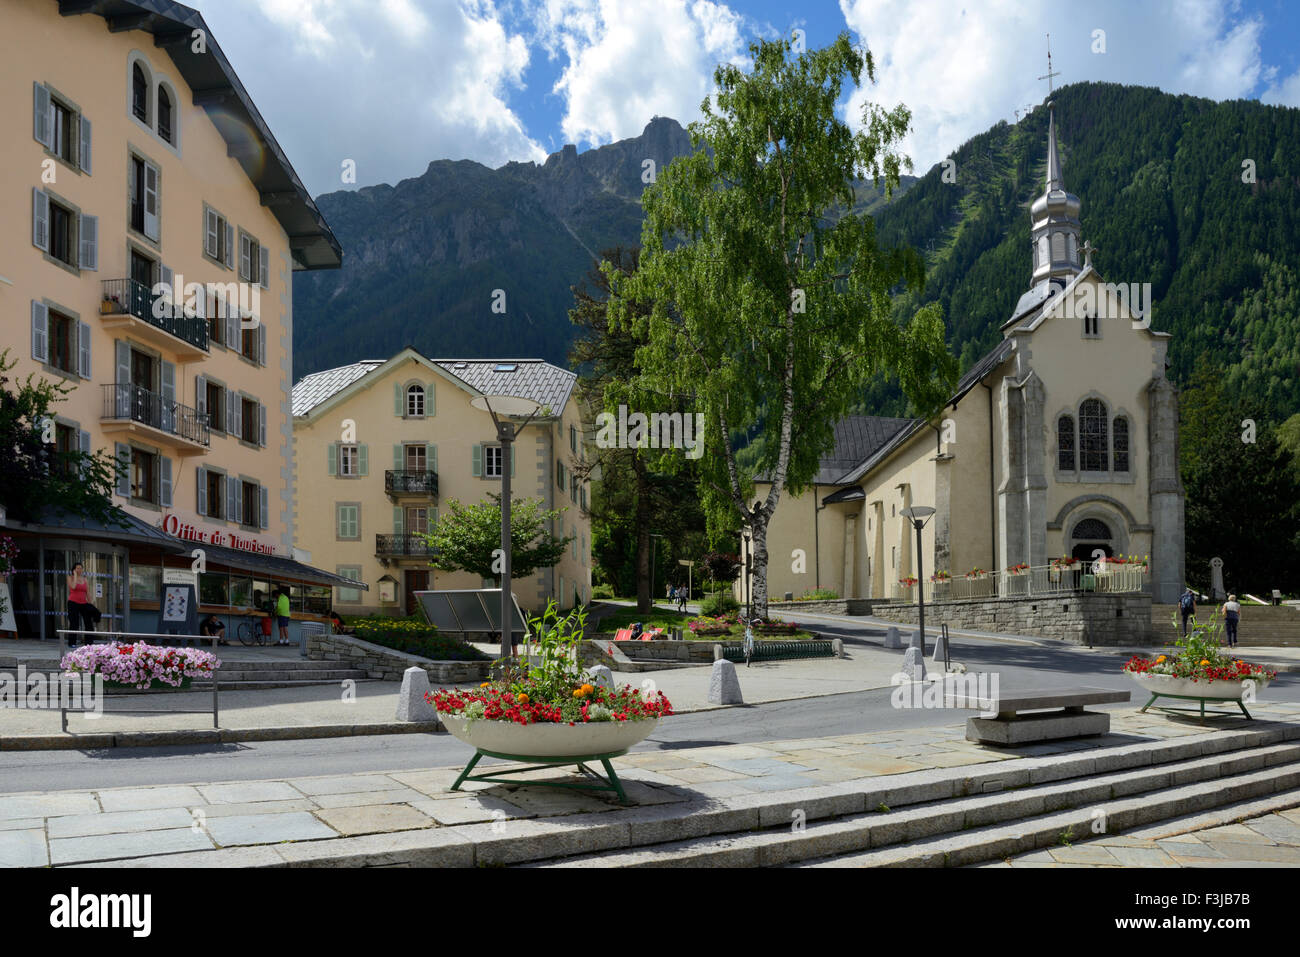 Office de tourisme stock photos office de tourisme stock images alamy - Office tourisme mont st michel ...